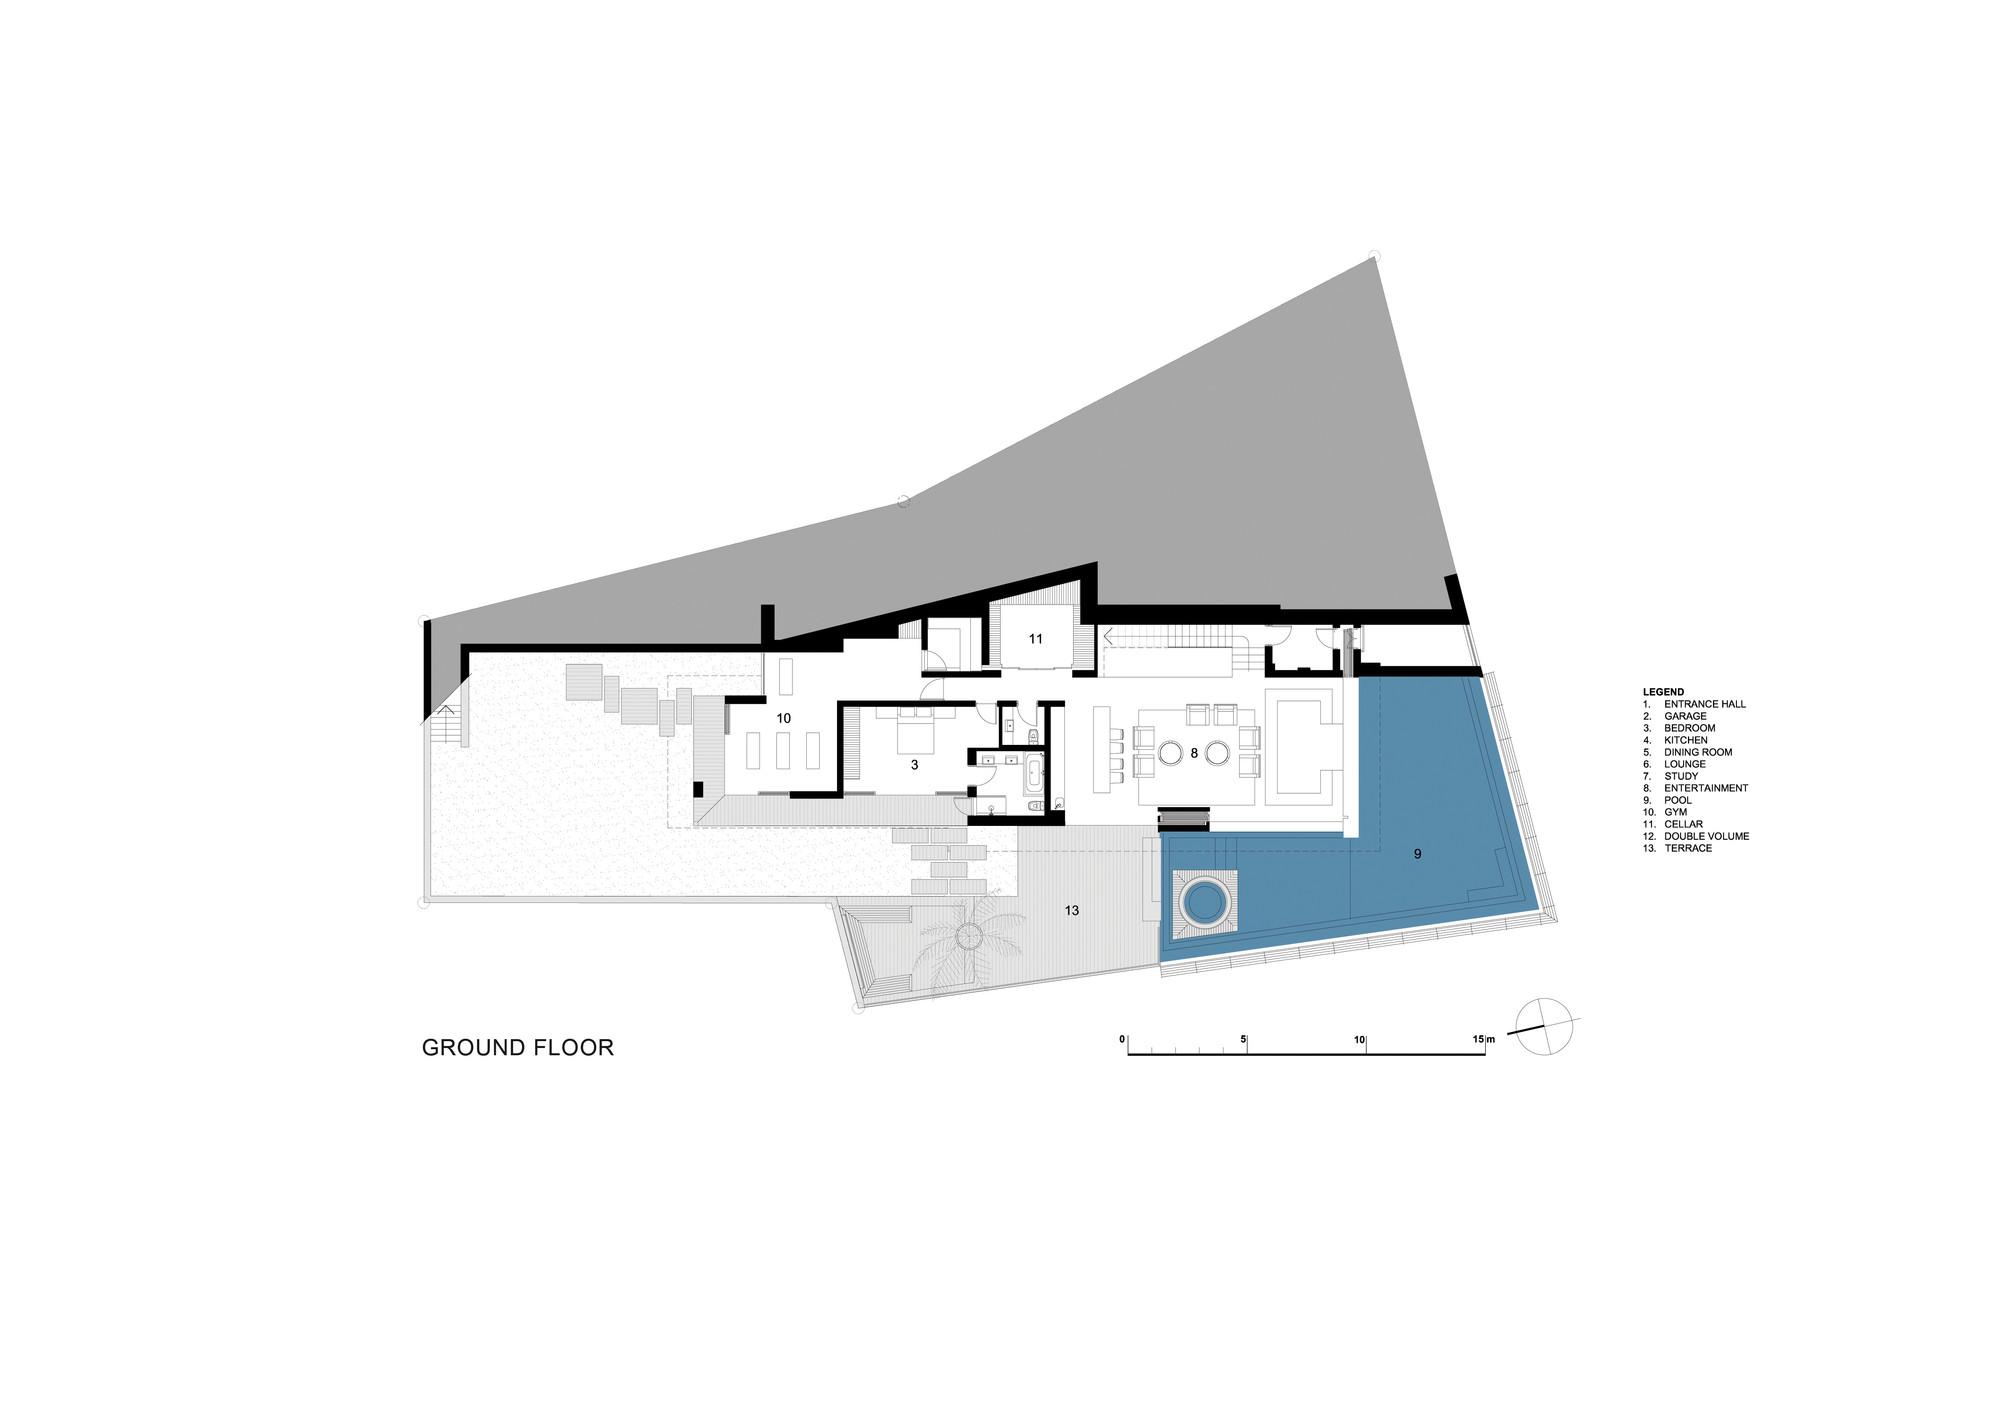 Gallery Of St Leon 10 Saota Stefan Antoni Olmesdahl Truen Architects 19